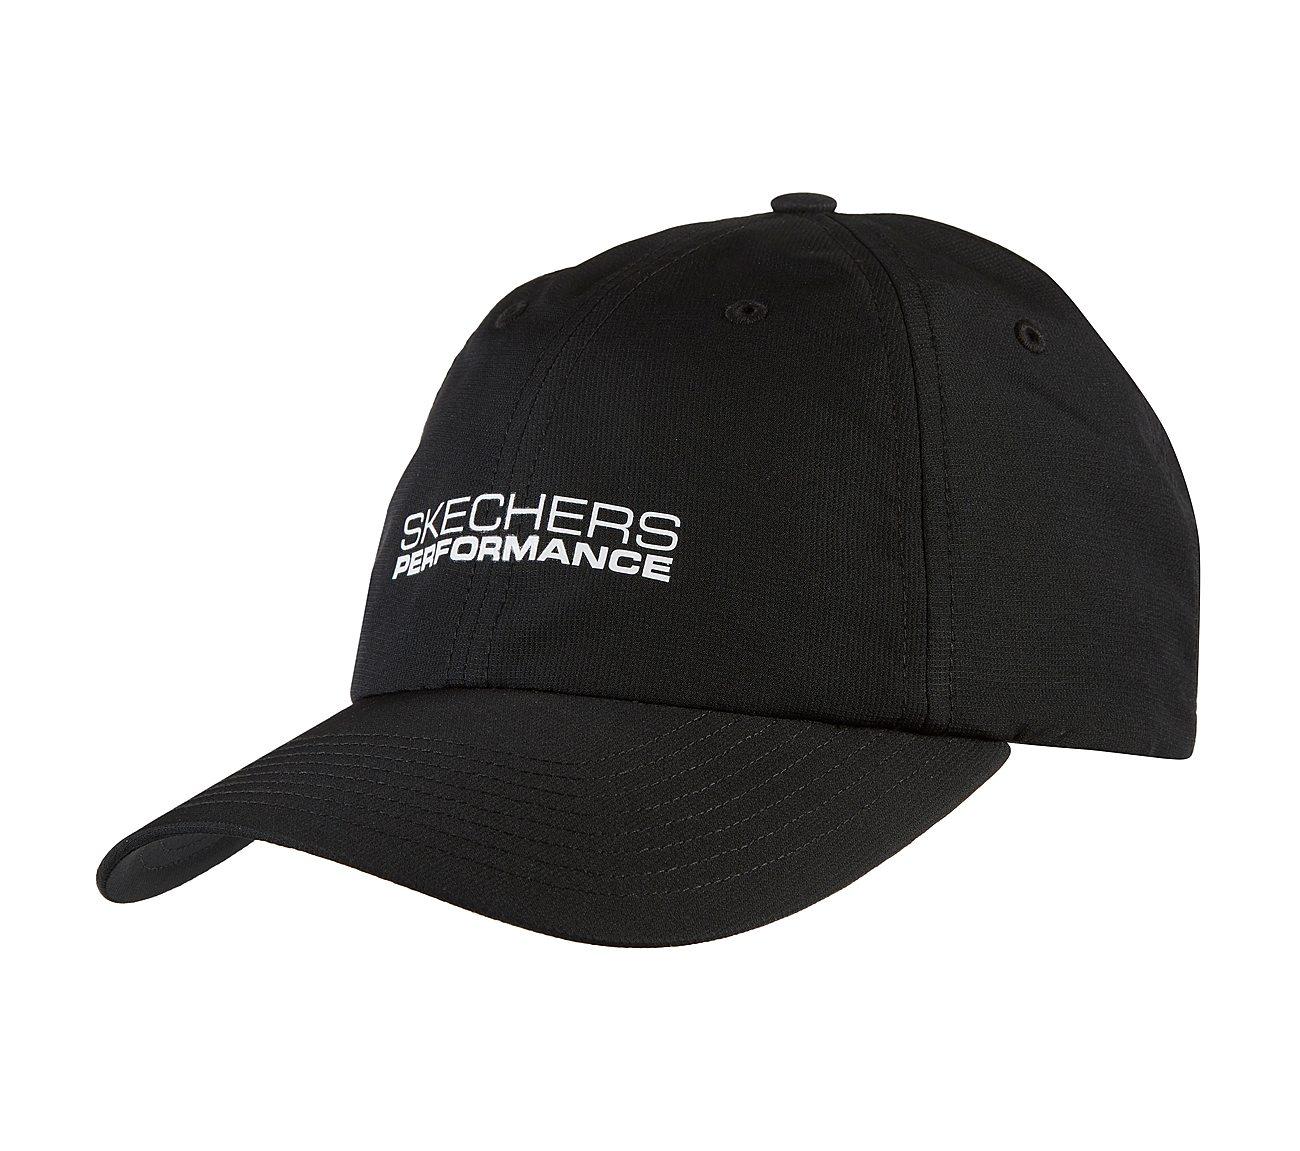 Skechers Performance Cap